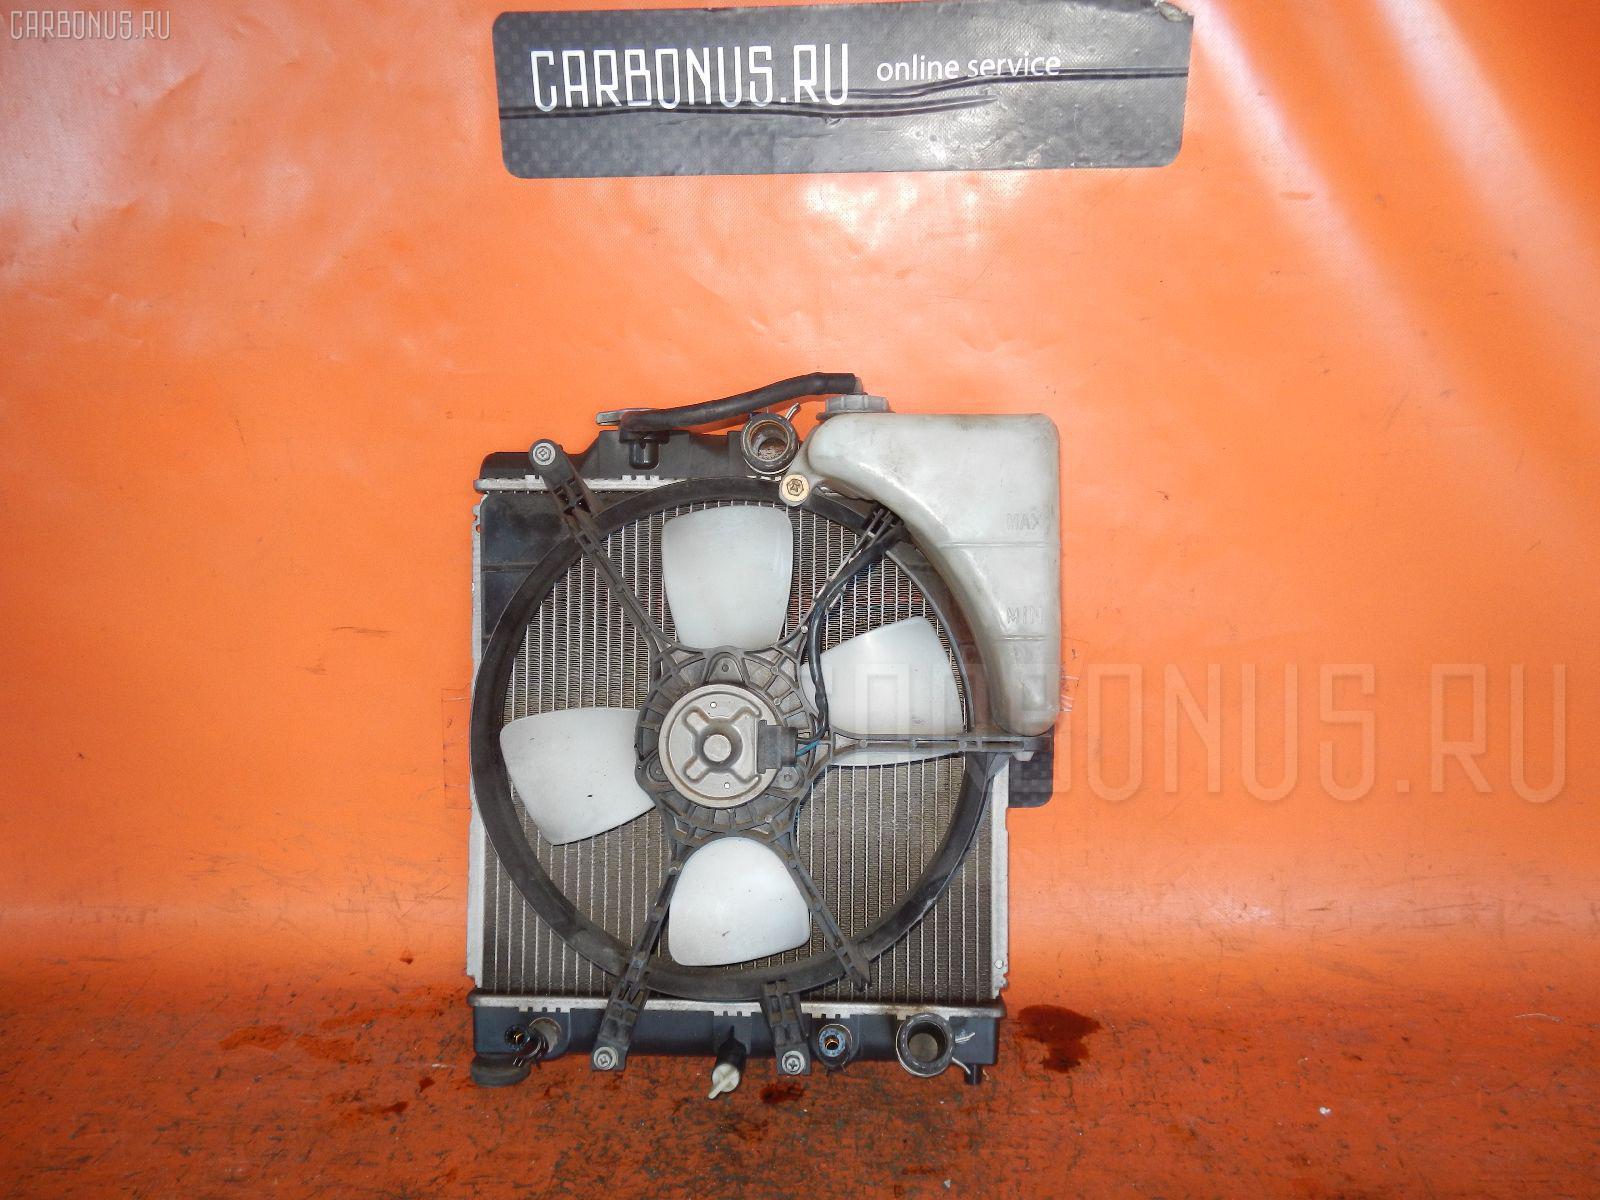 Радиатор ДВС HONDA HR-V GH4 D16A. Фото 1